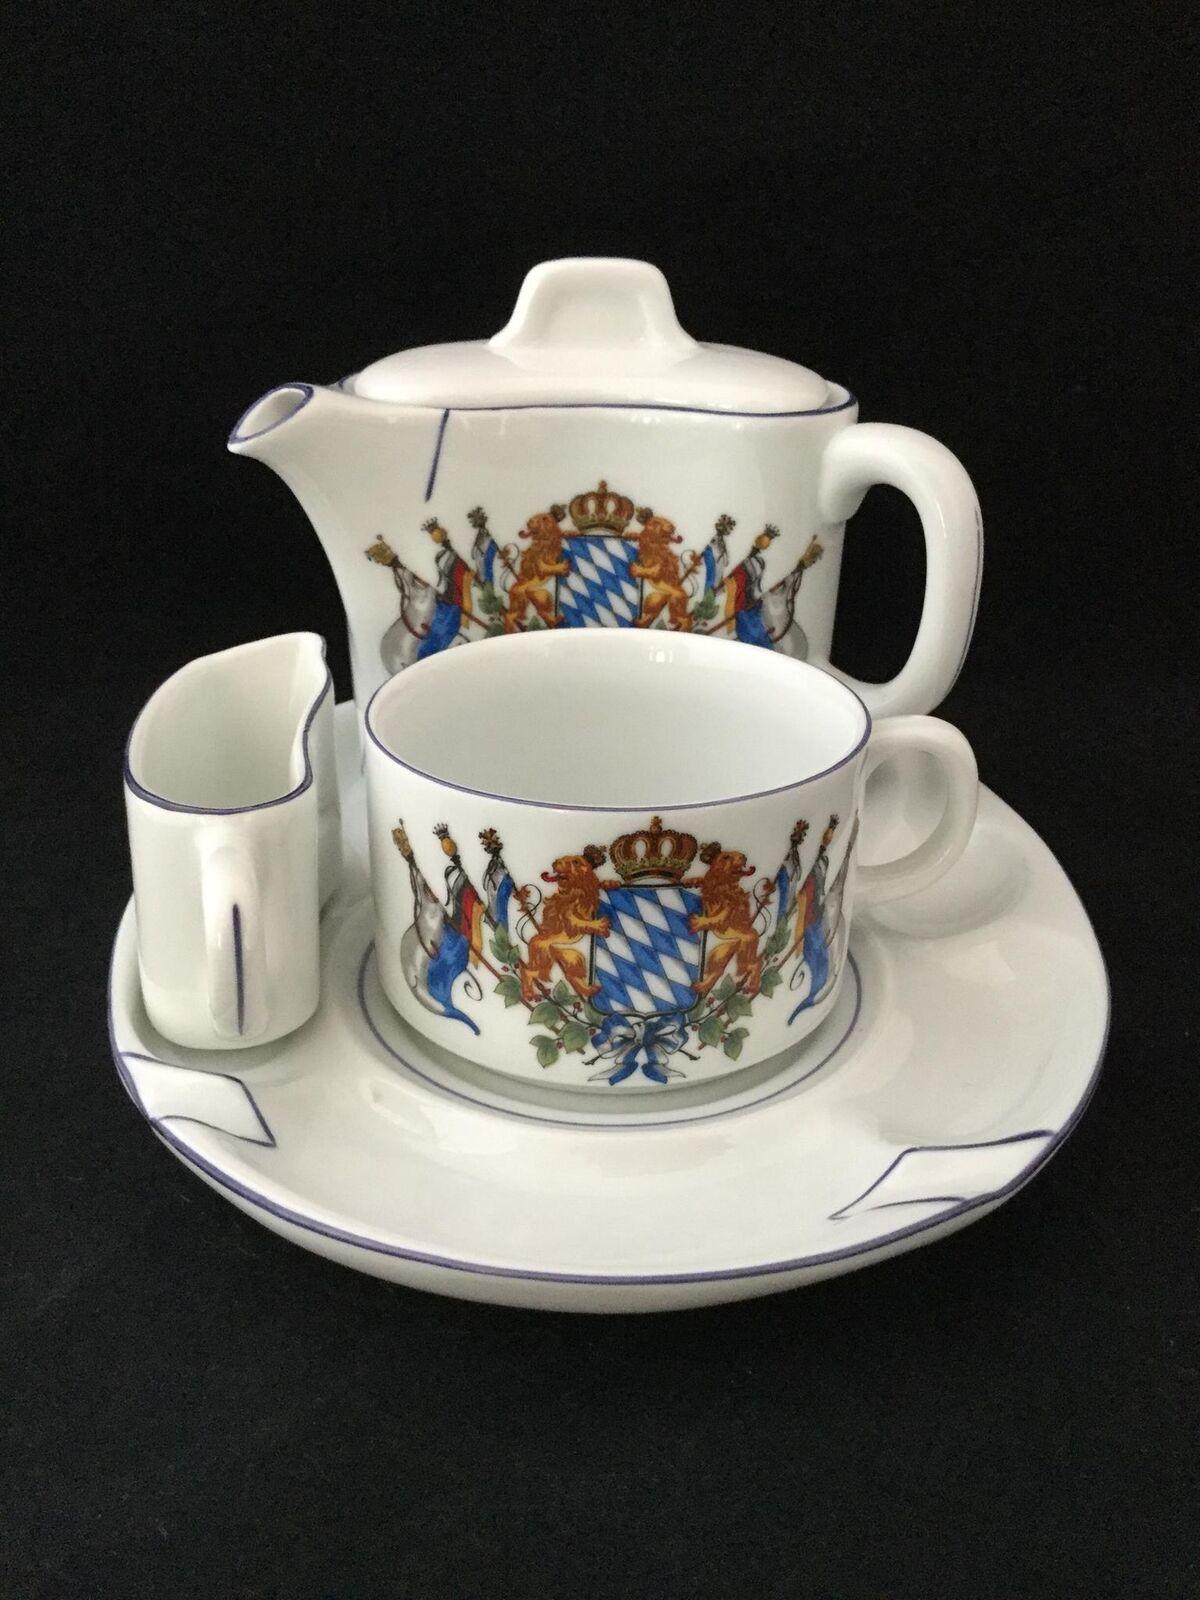 Pozellan frabrik Lang Ebrach Armoiries Théière Creamer tasse et assiette de service